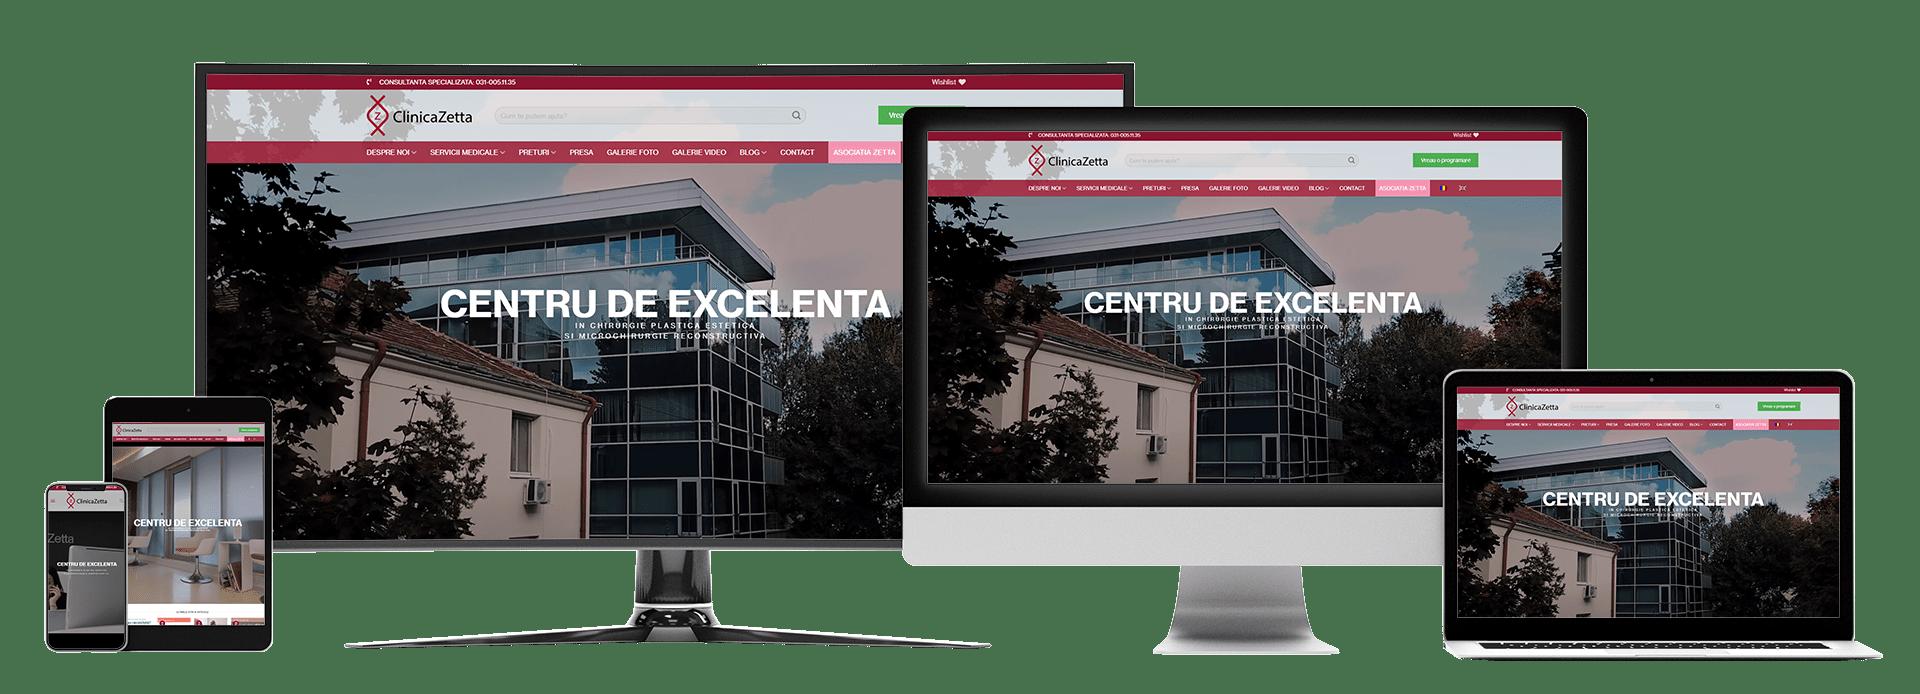 Realizare webiste Clinica Zetta